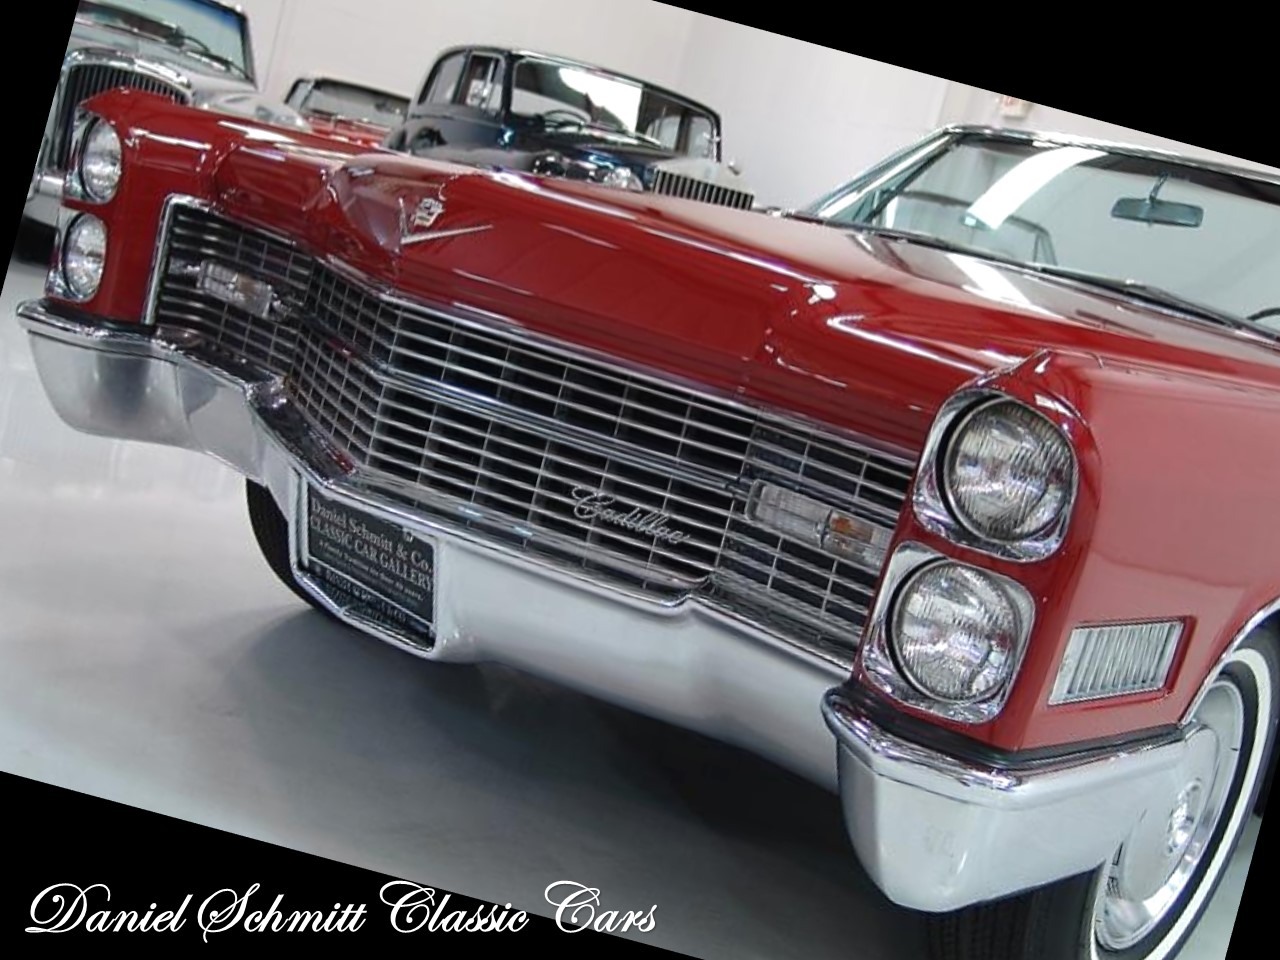 1966 Cadillac DeVille Convertible   NotoriousLuxury